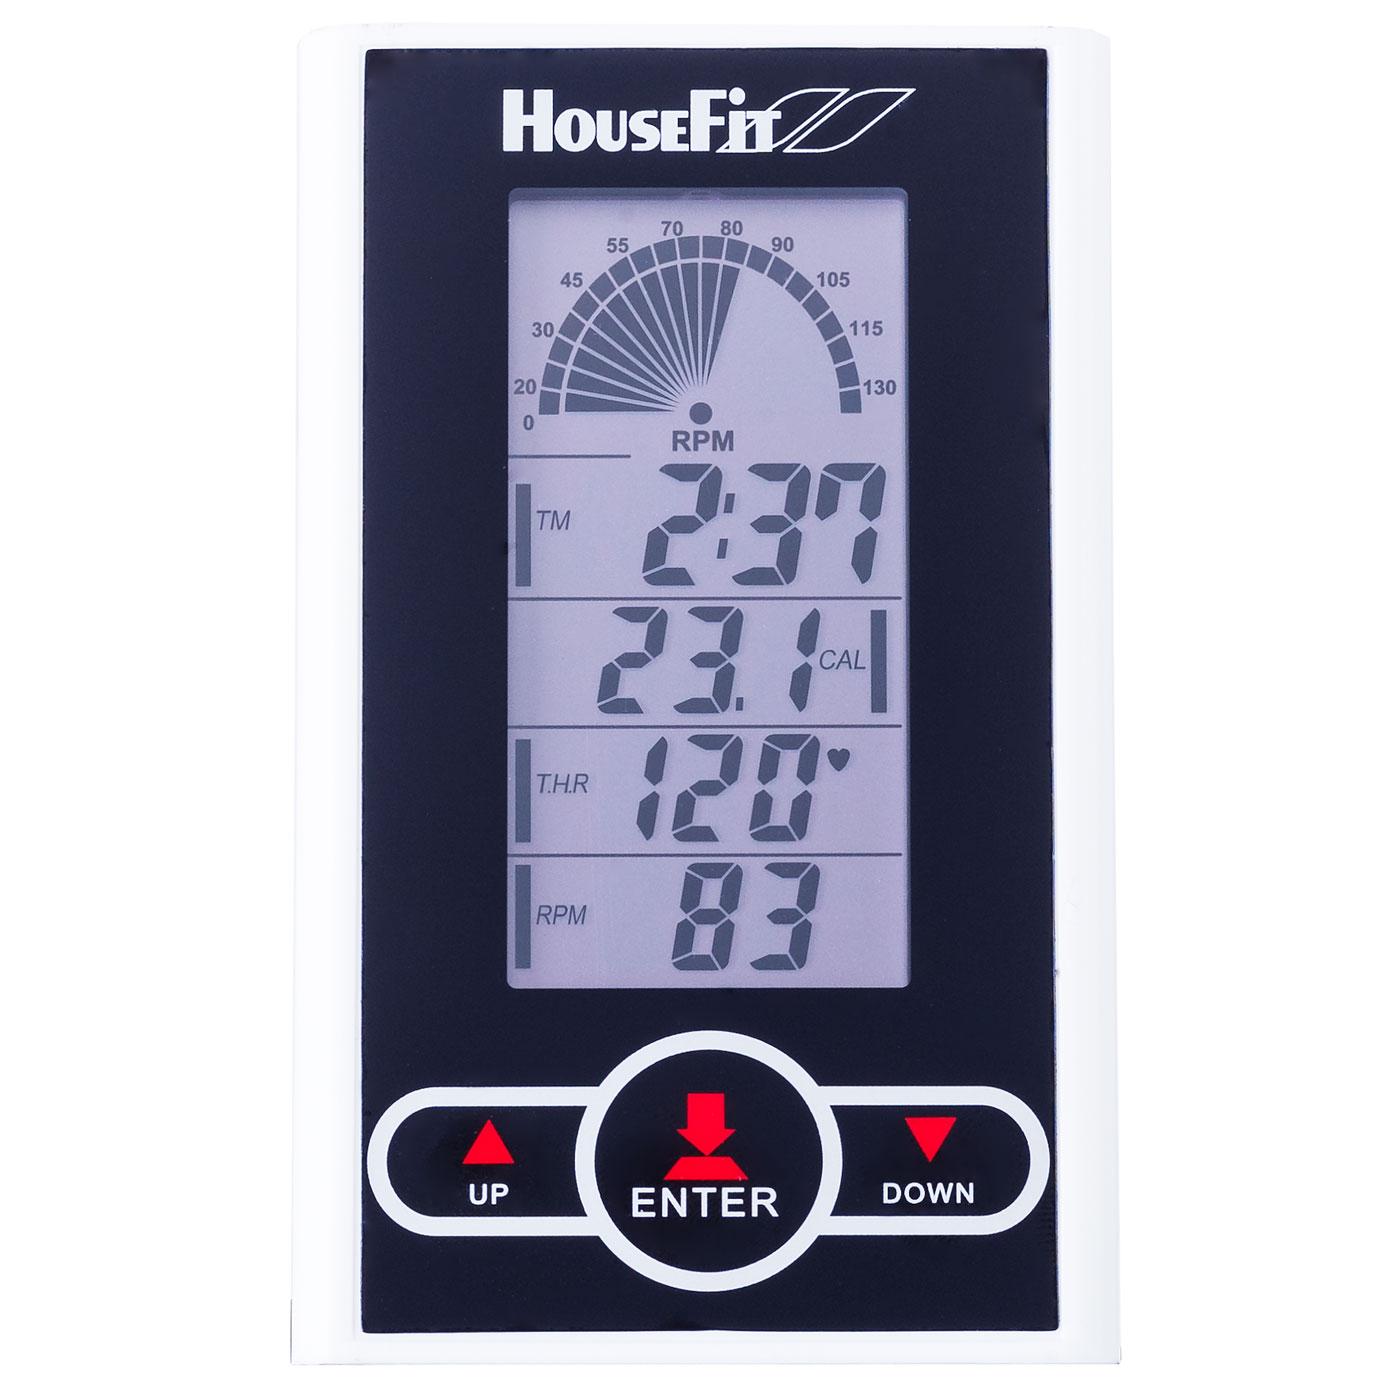 HouseFit Racer 50_08